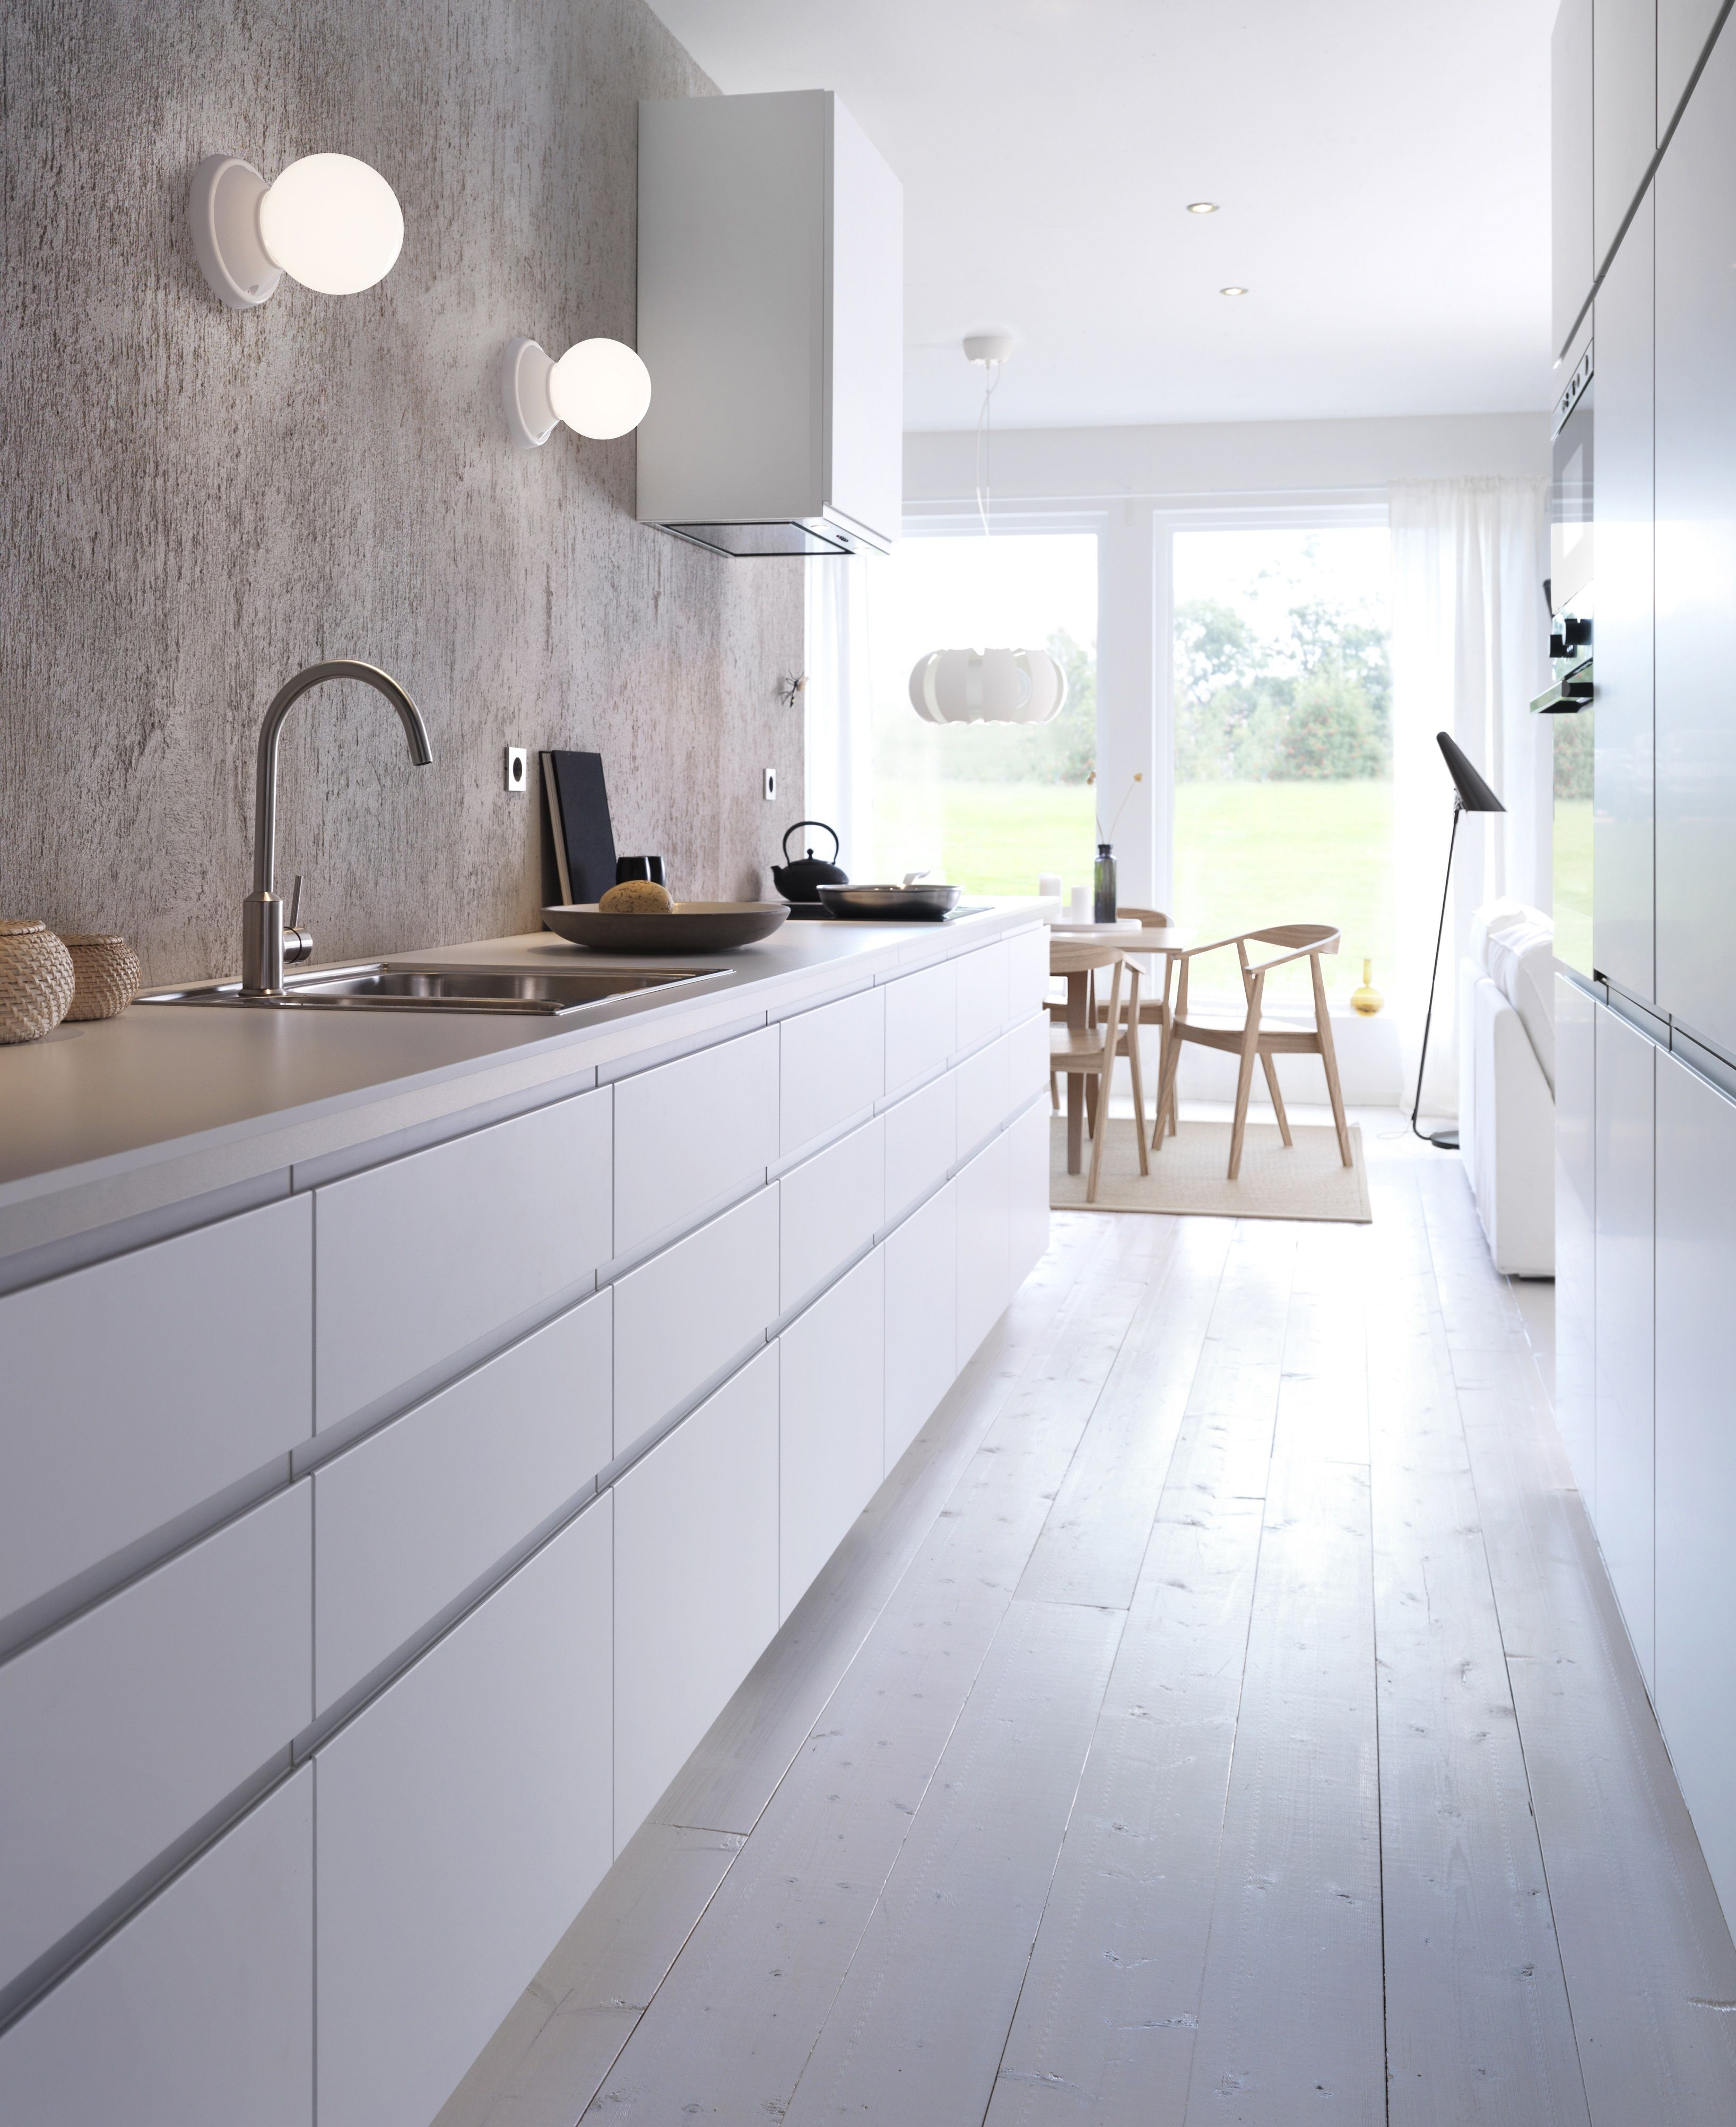 Kitchen Starter Set Ikea: Ikea Küche Hängeschrank